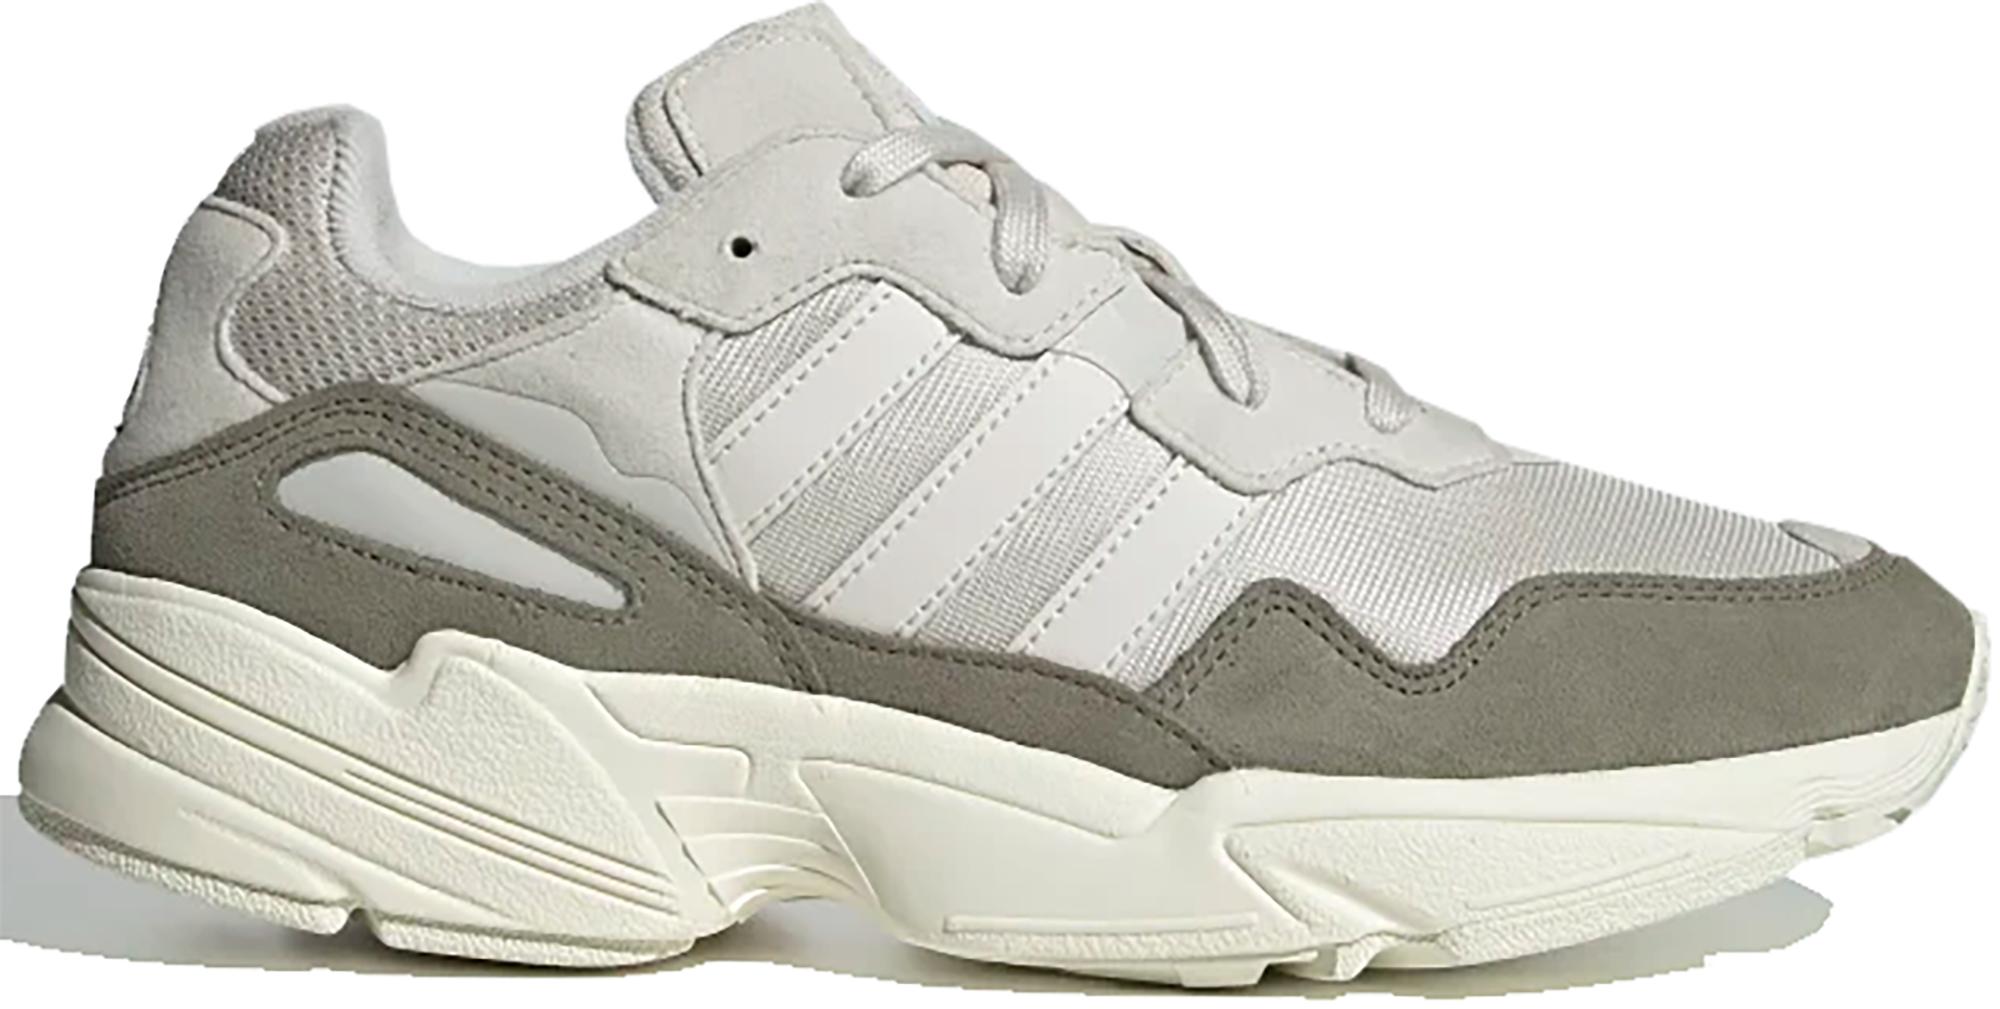 adidas Yung-96 Raw White - EE7244